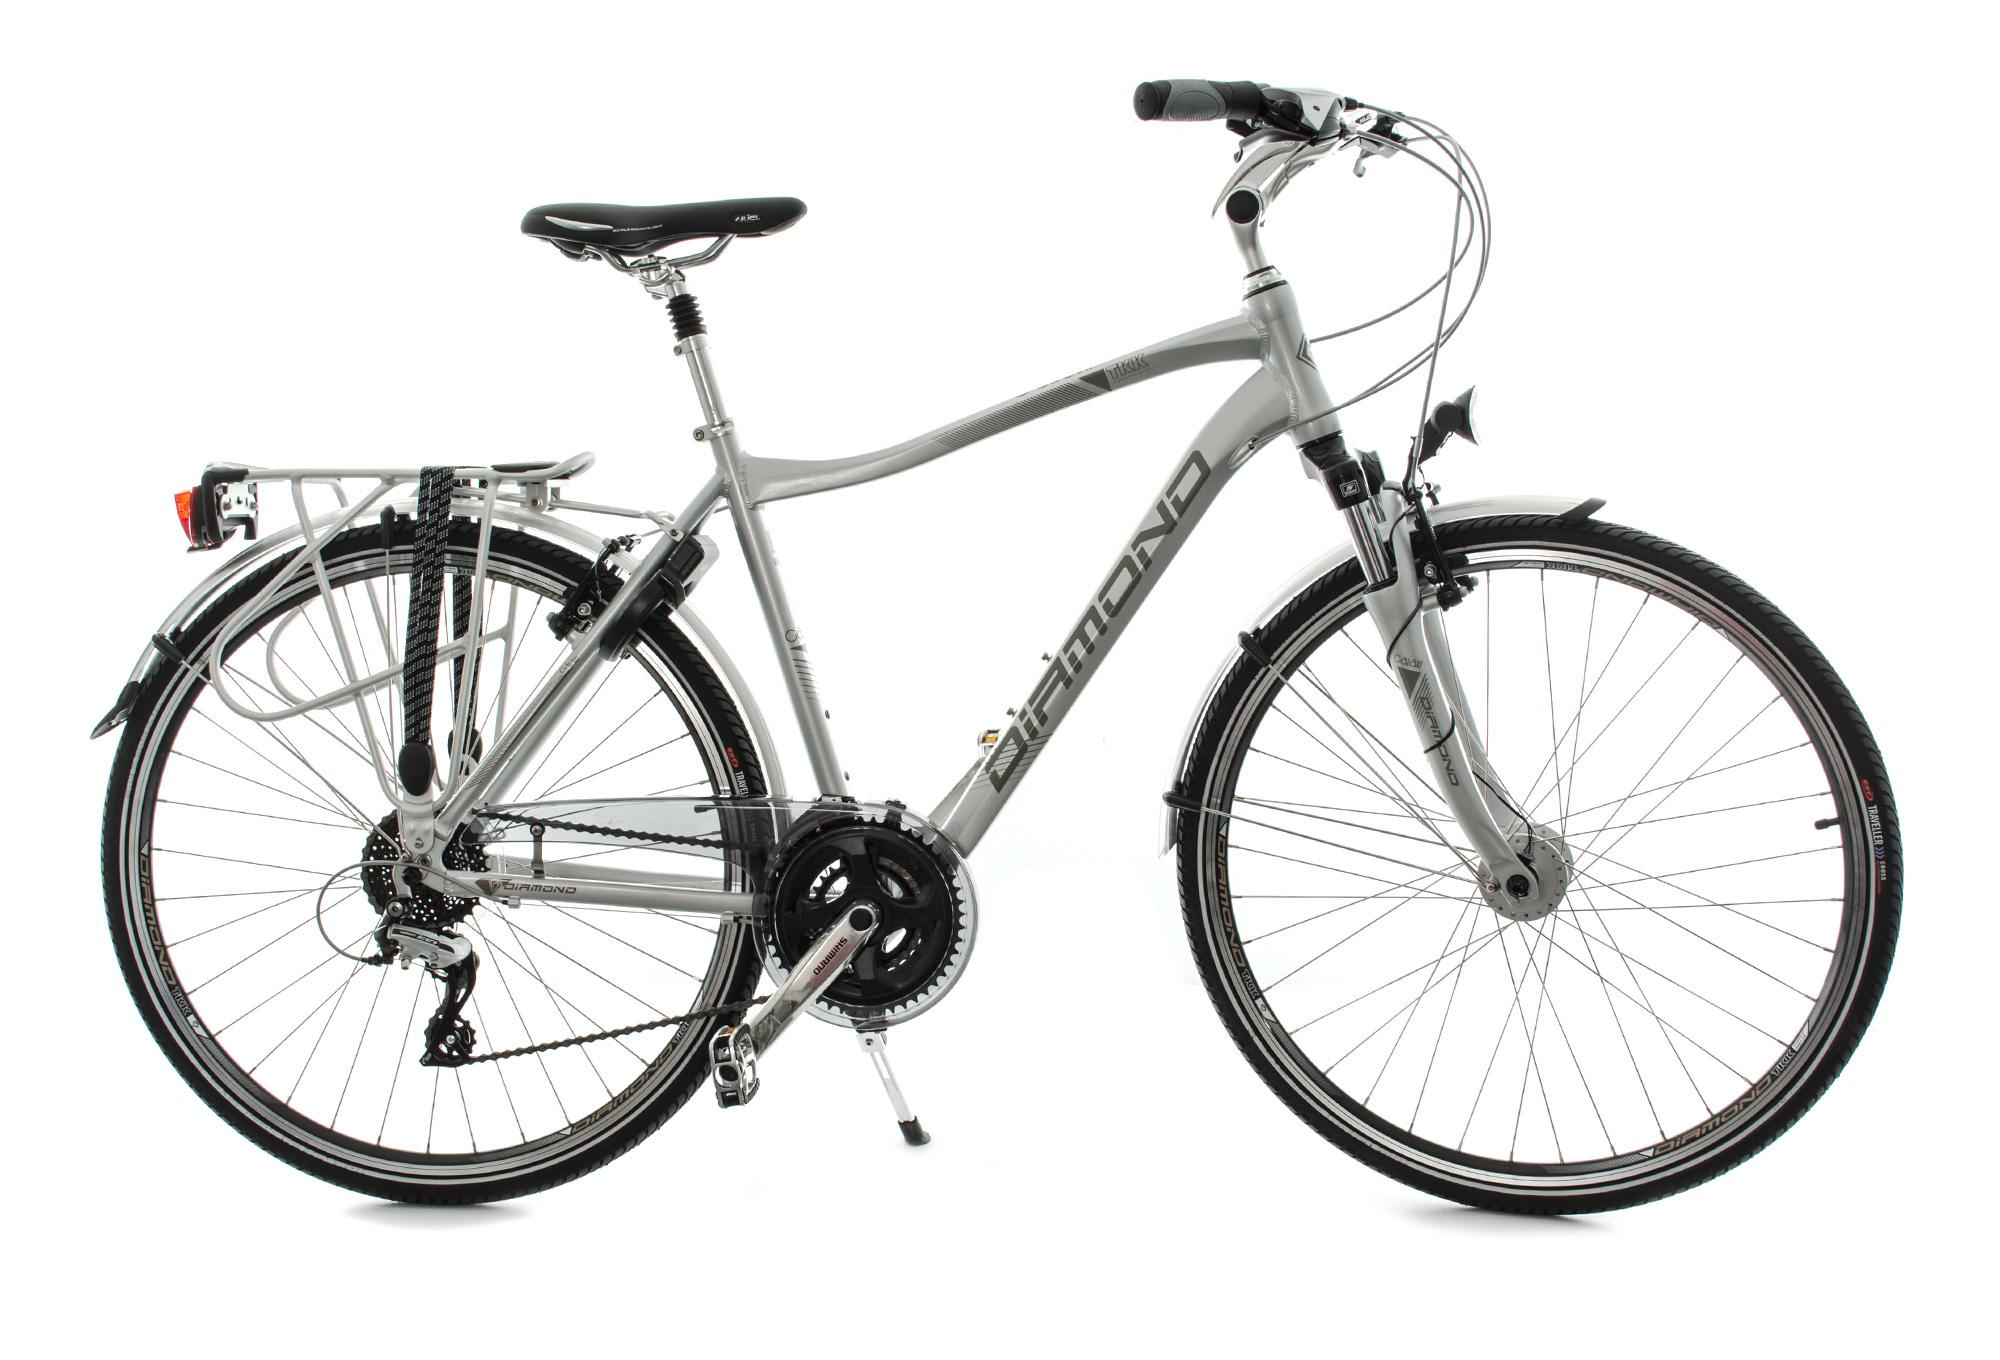 rahmengr e mtb frauen ersatzteile zu dem fahrrad. Black Bedroom Furniture Sets. Home Design Ideas